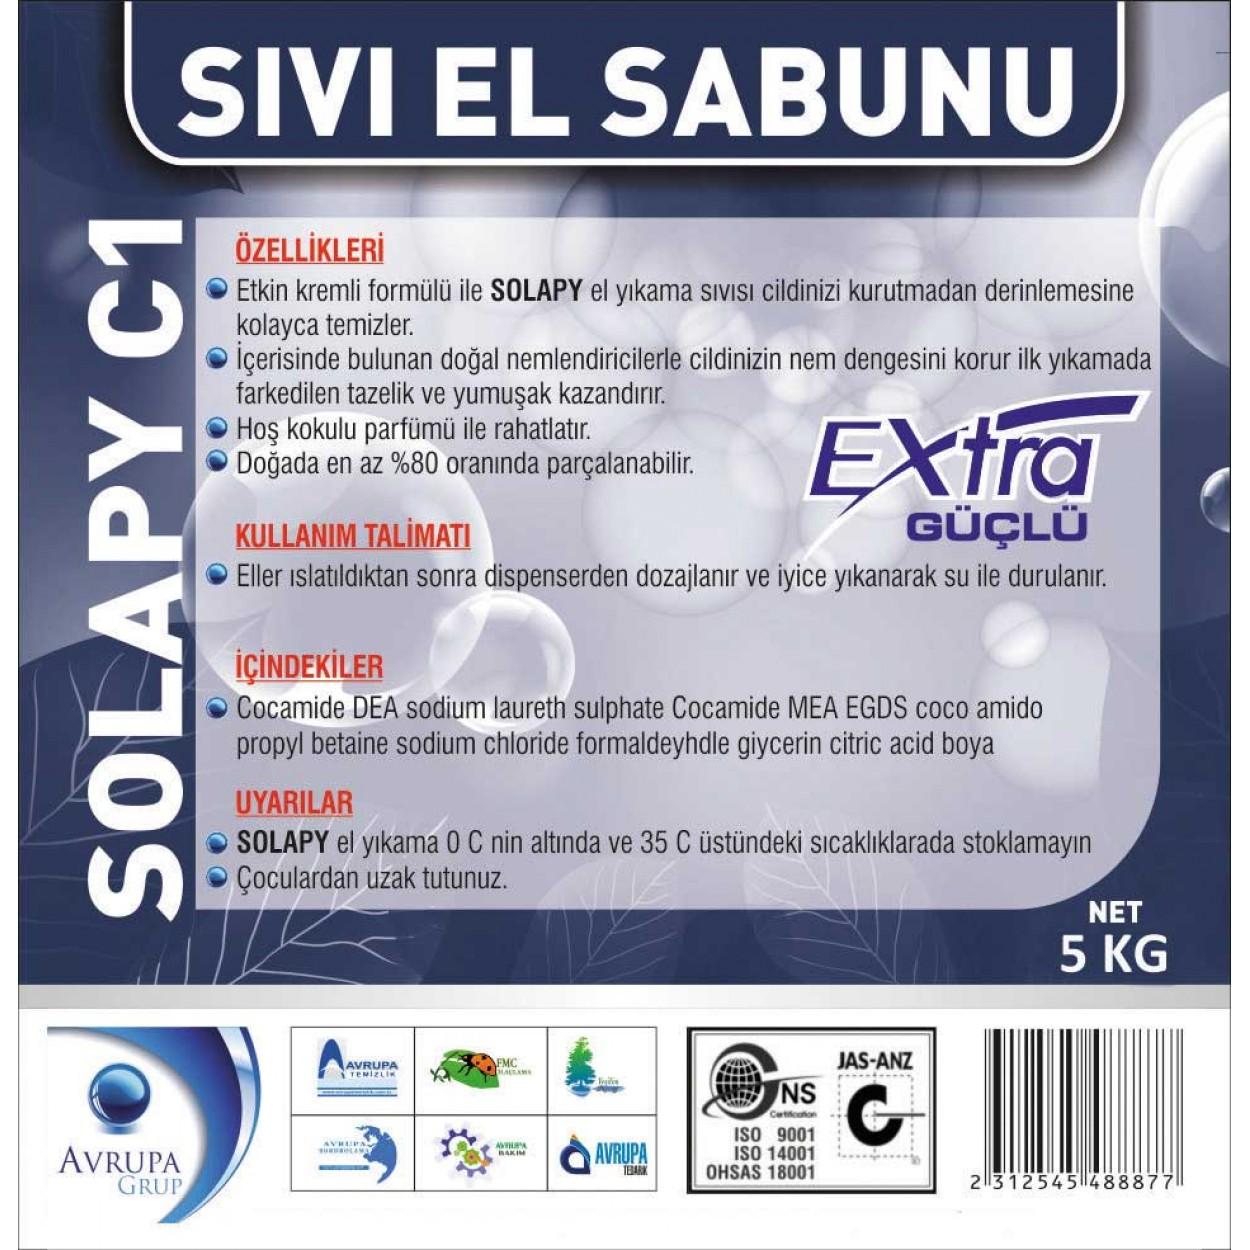 Solapy C1 Sedefli Parfümlü El Yıkama Sıvısı Ekstra 5 Litre